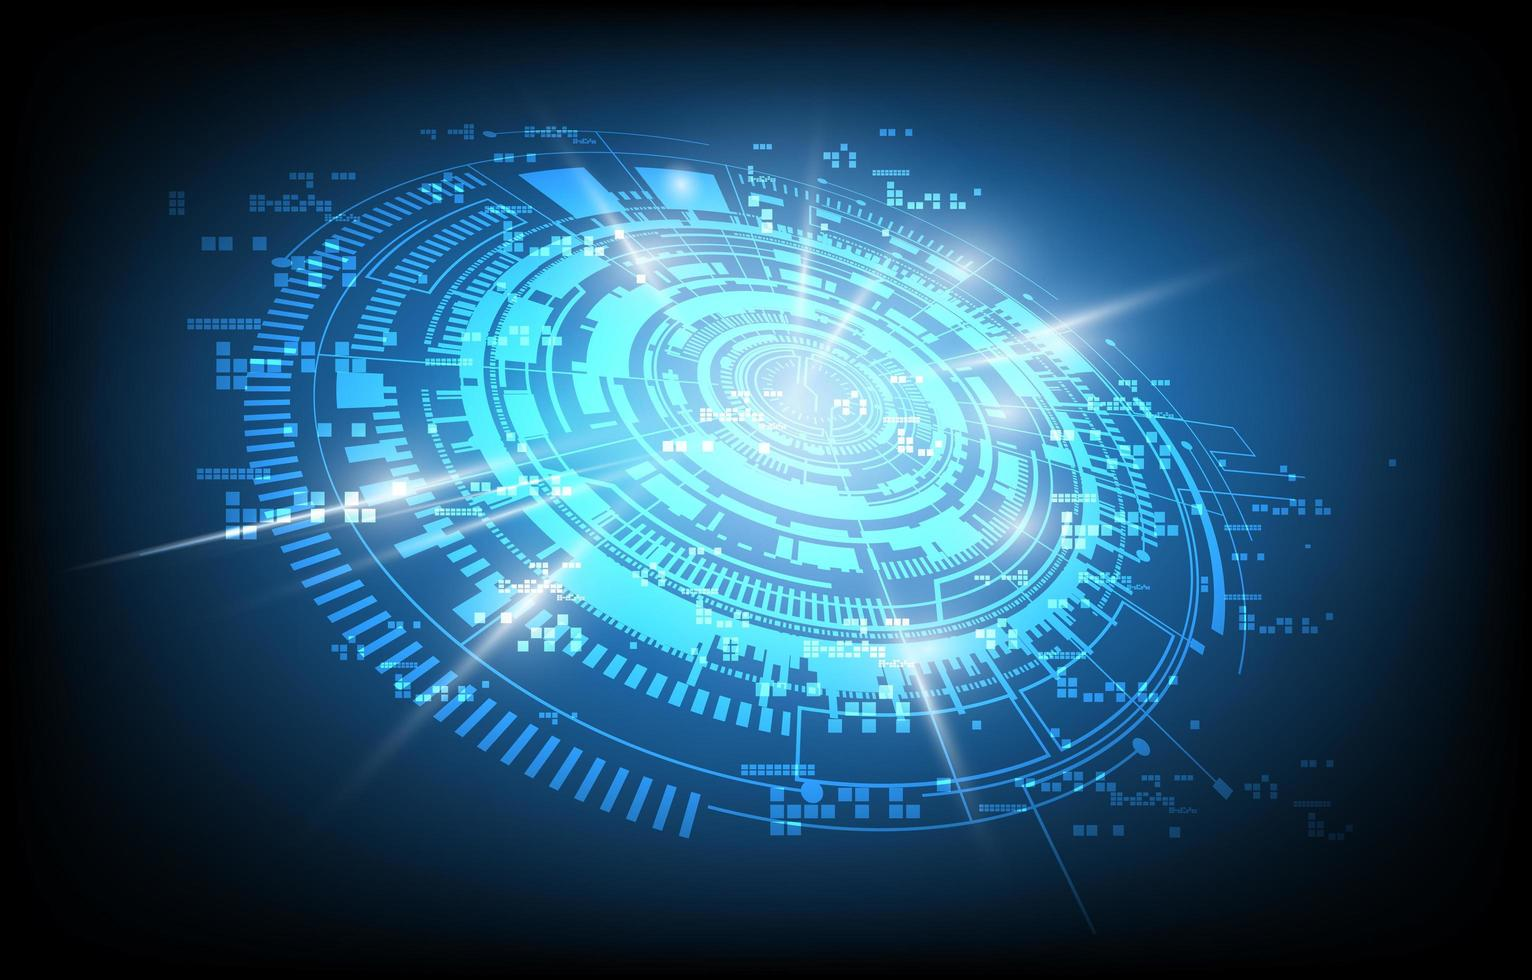 design futuriste circulaire bleu brillant vecteur